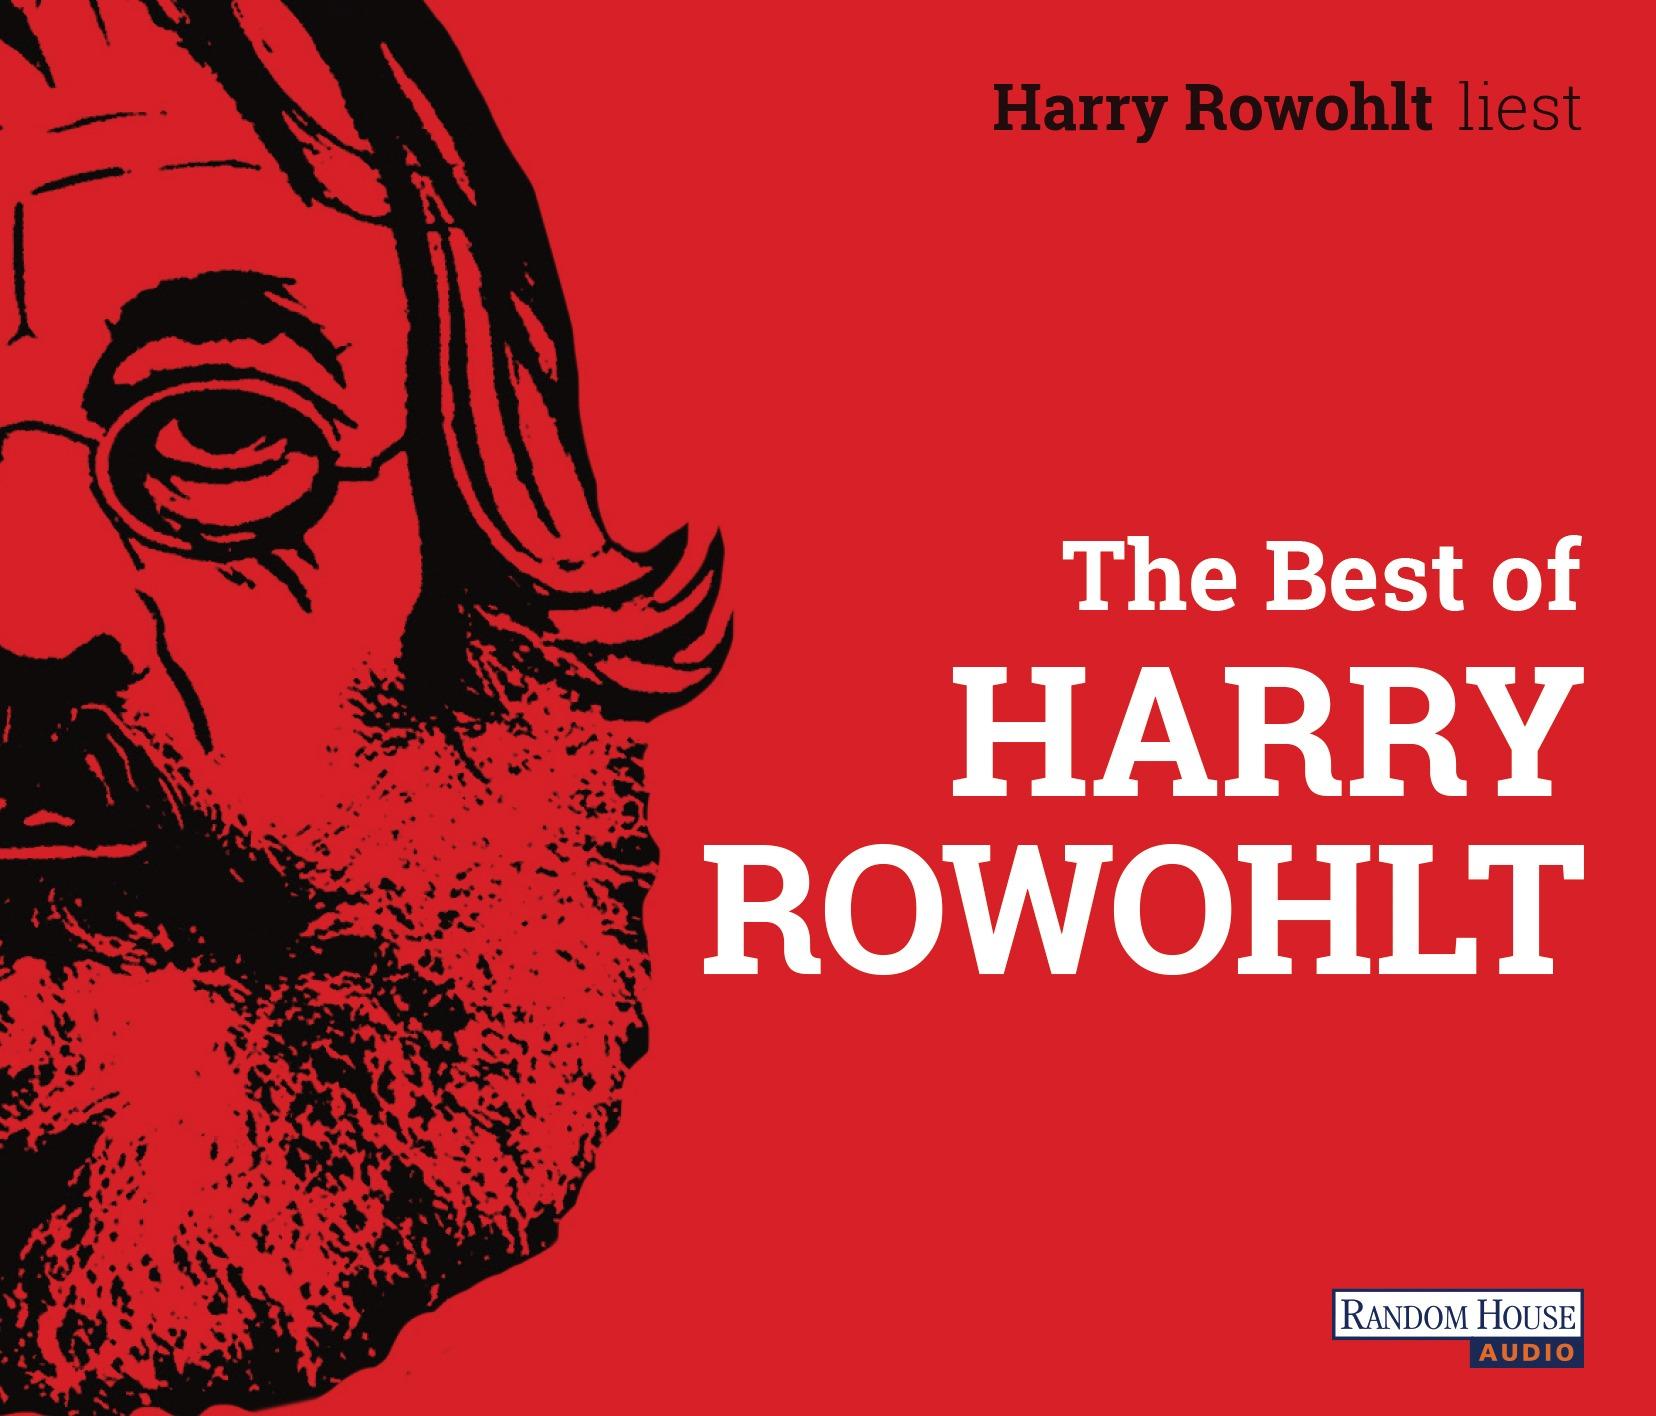 The Best of Harry Rowohlt - Harry Rowohlt